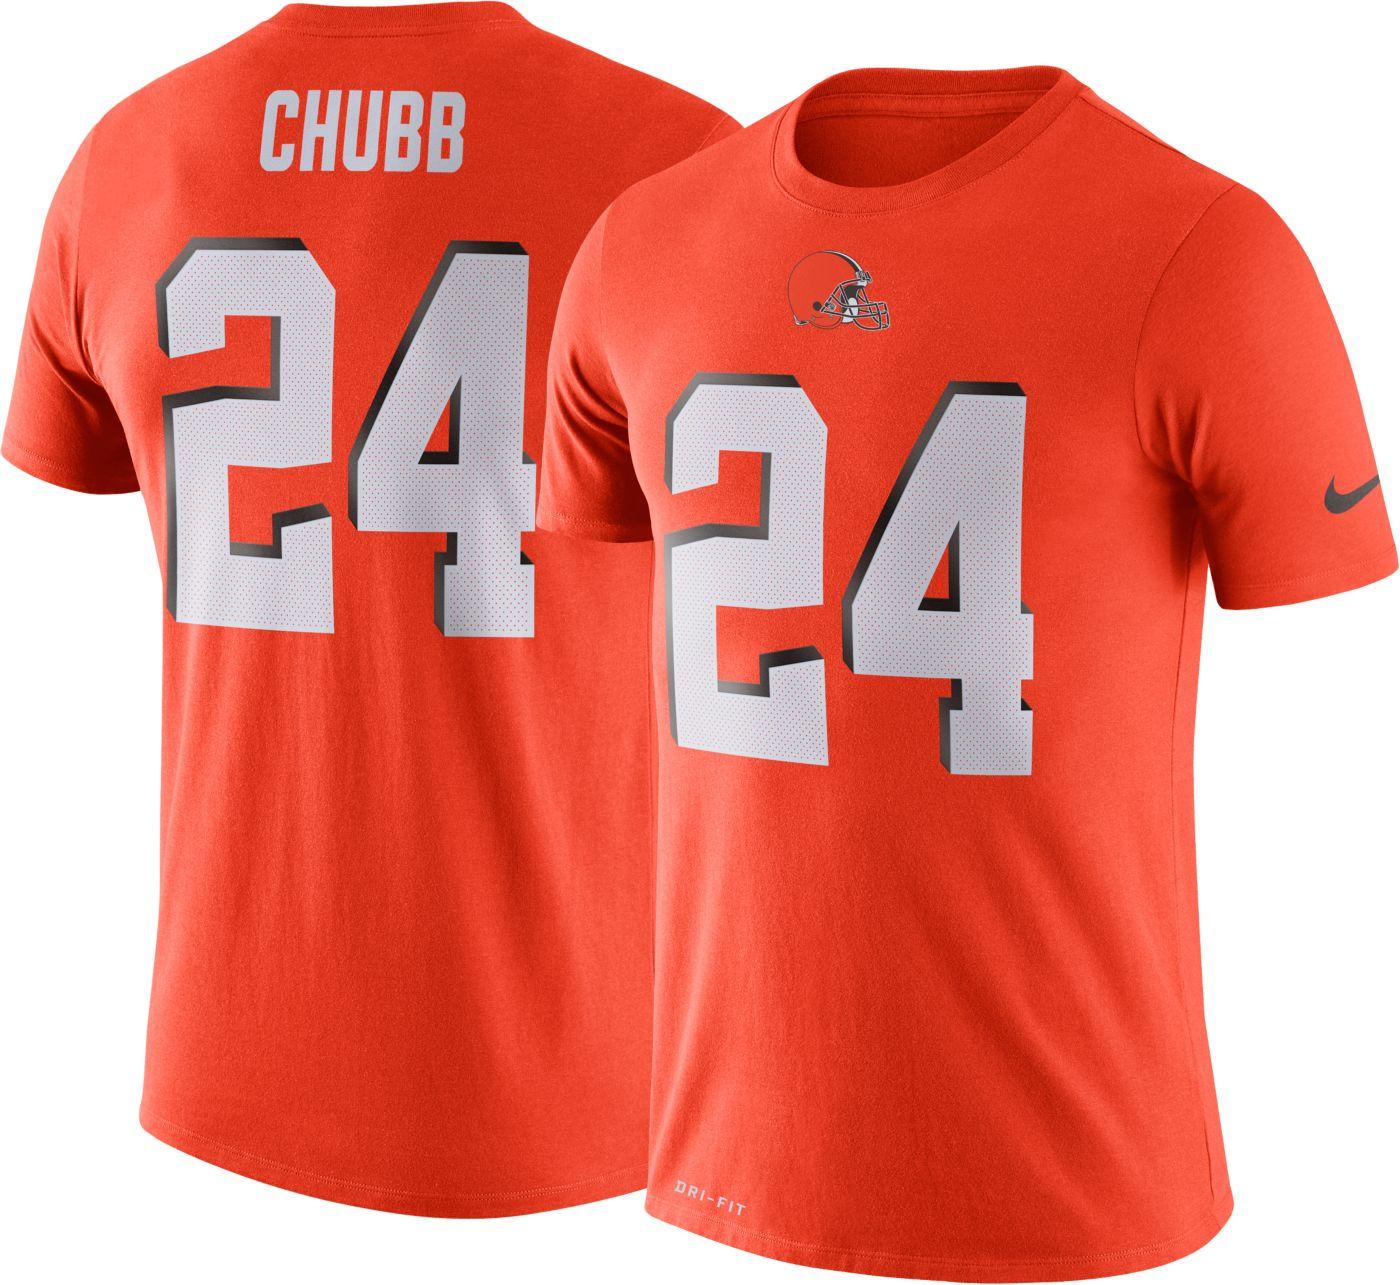 Nike Men's Cleveland Browns Nick Chubb #24 Logo Orange T-Shirt